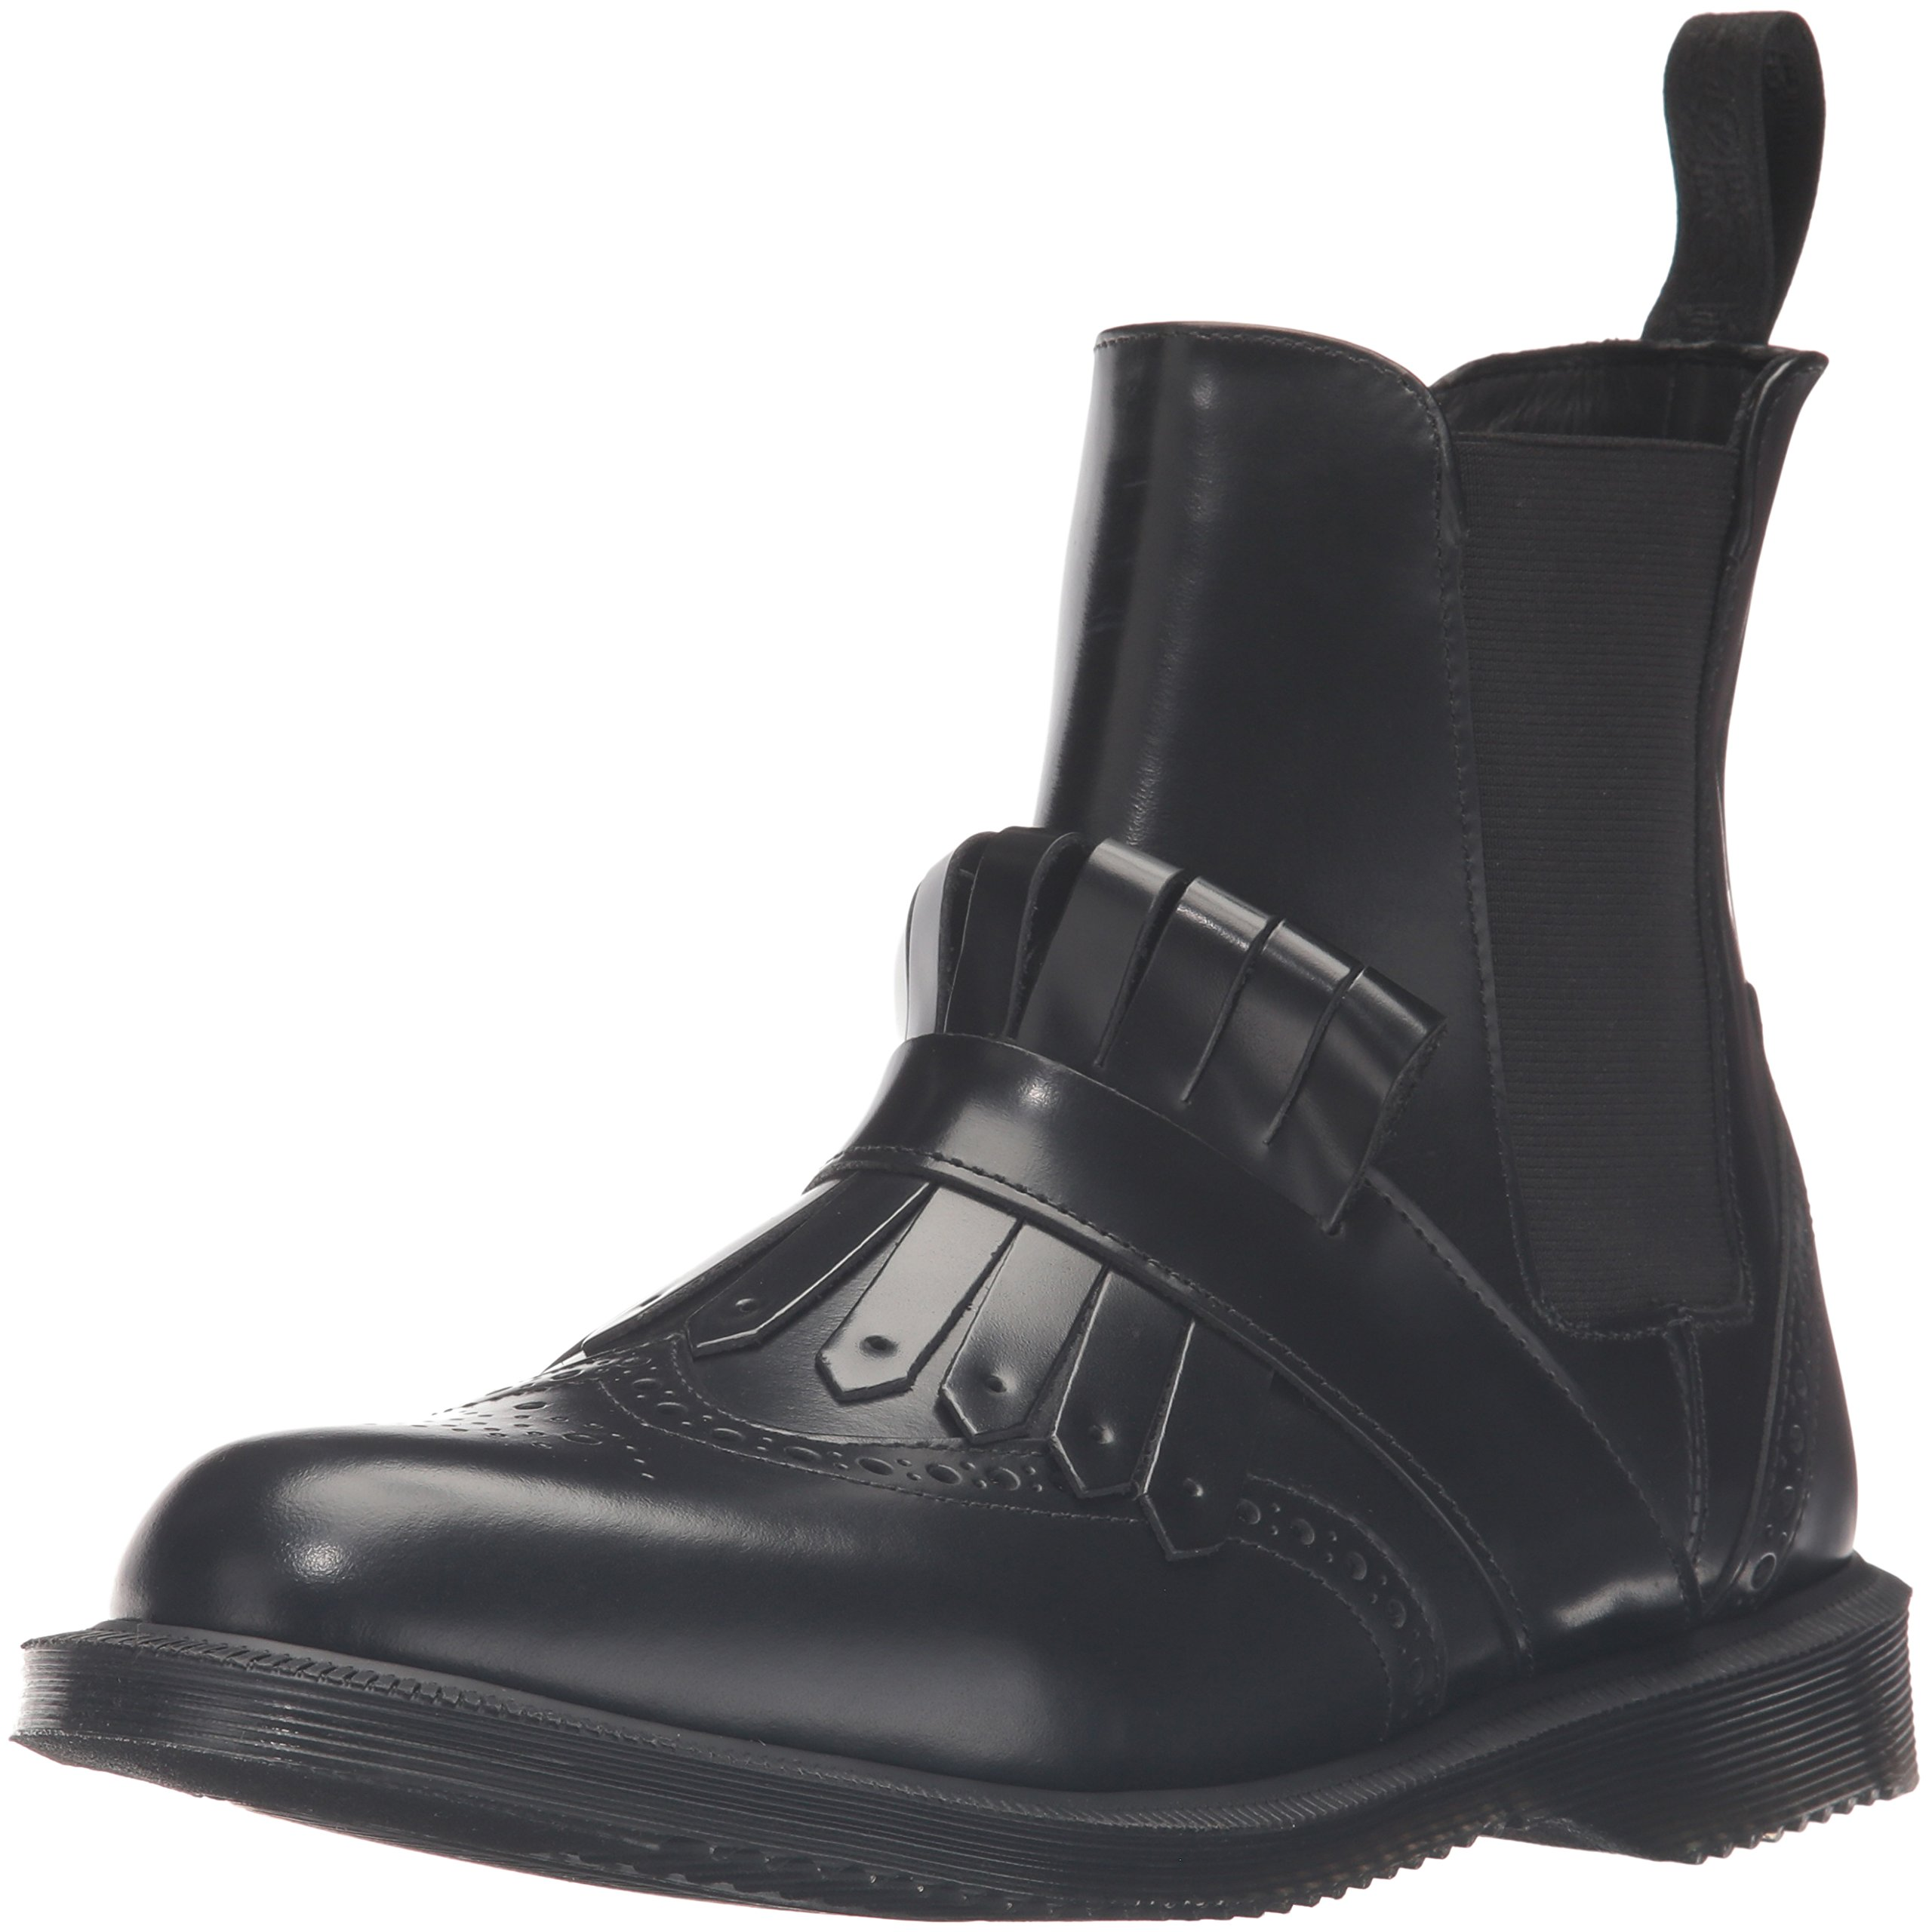 Dr. Martens Women's Tina Chukka Boot, Black, 5 UK/7 M US by Dr. Martens